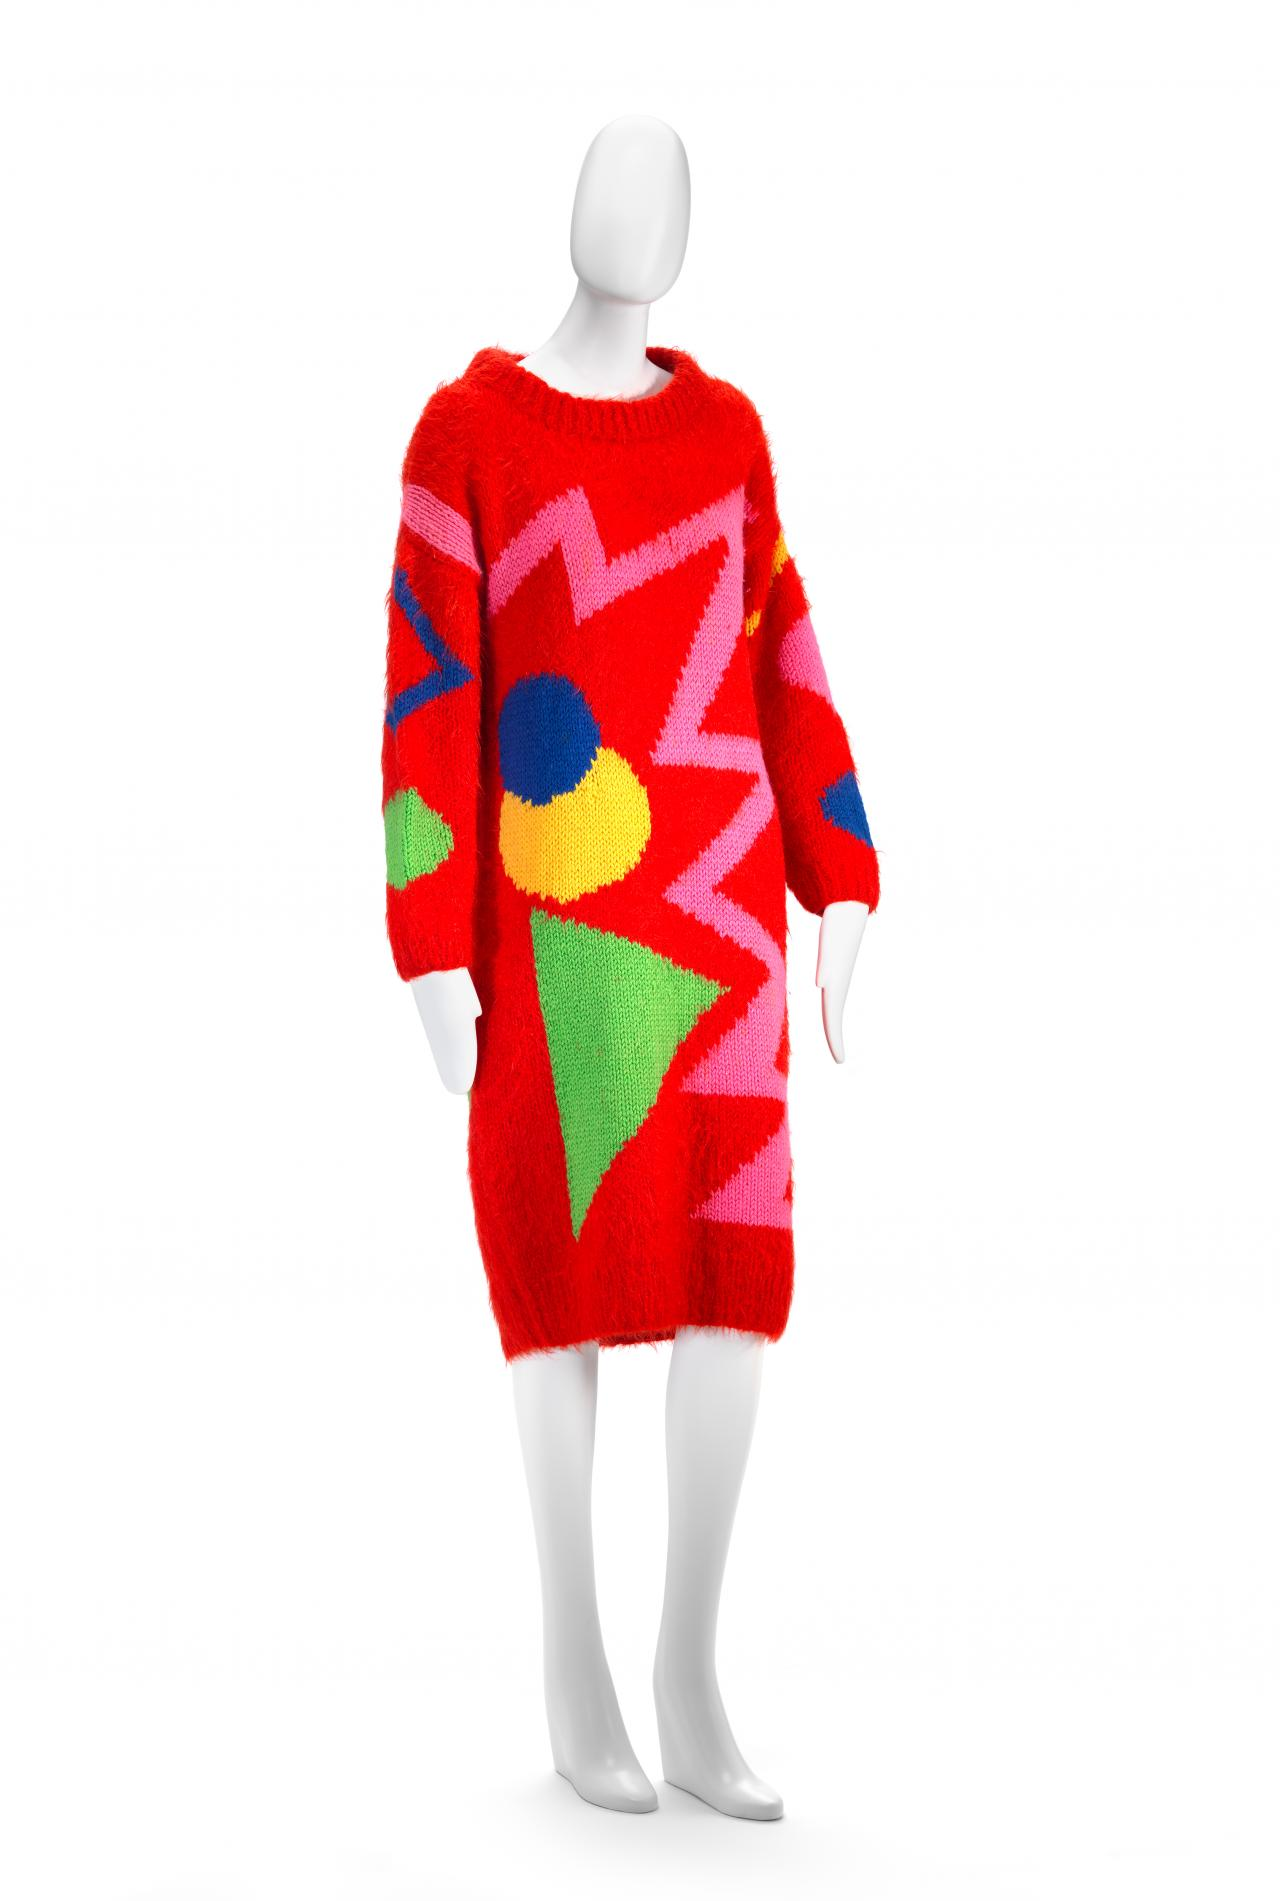 Dress Flamingo Park Sydney Fashion House Jenny Kee Designer Jan Ayres Knitter Ngv View Work